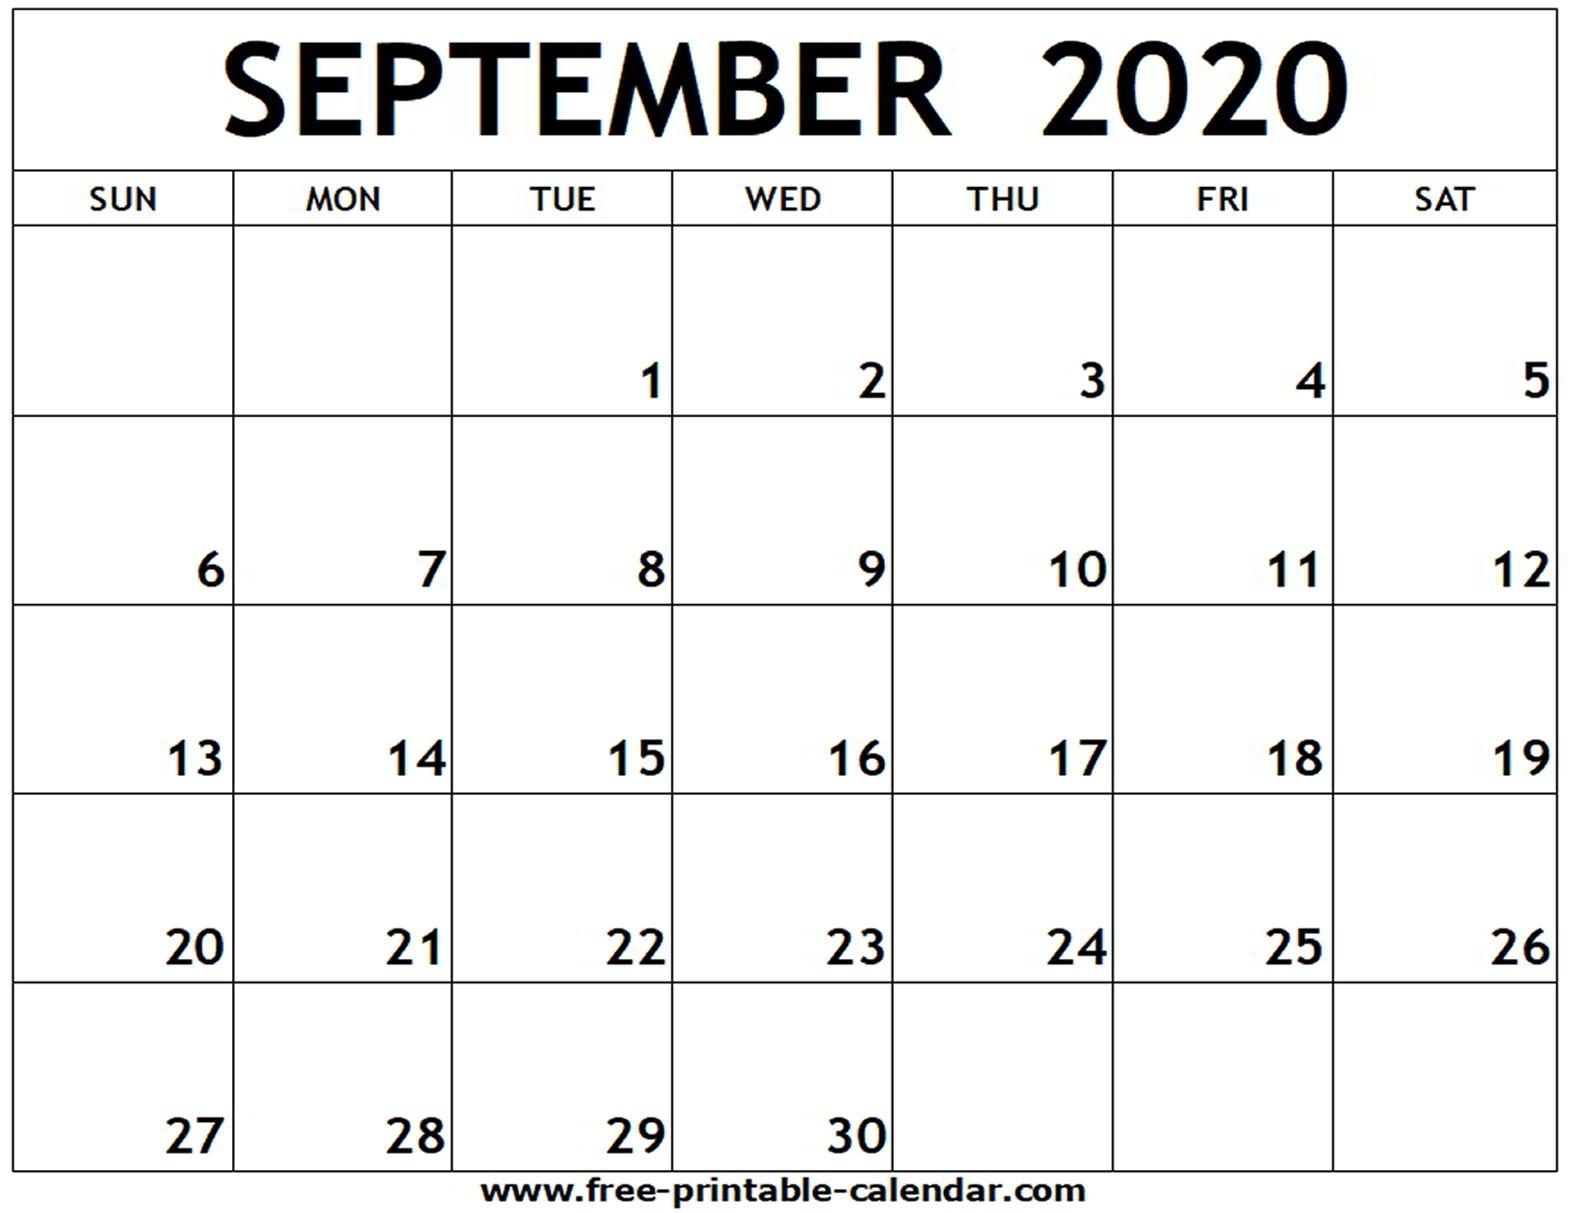 September 2020 Printable Calendar - Free-Printable-Calendar within Calendar September 2020 Start Monday Printable Free